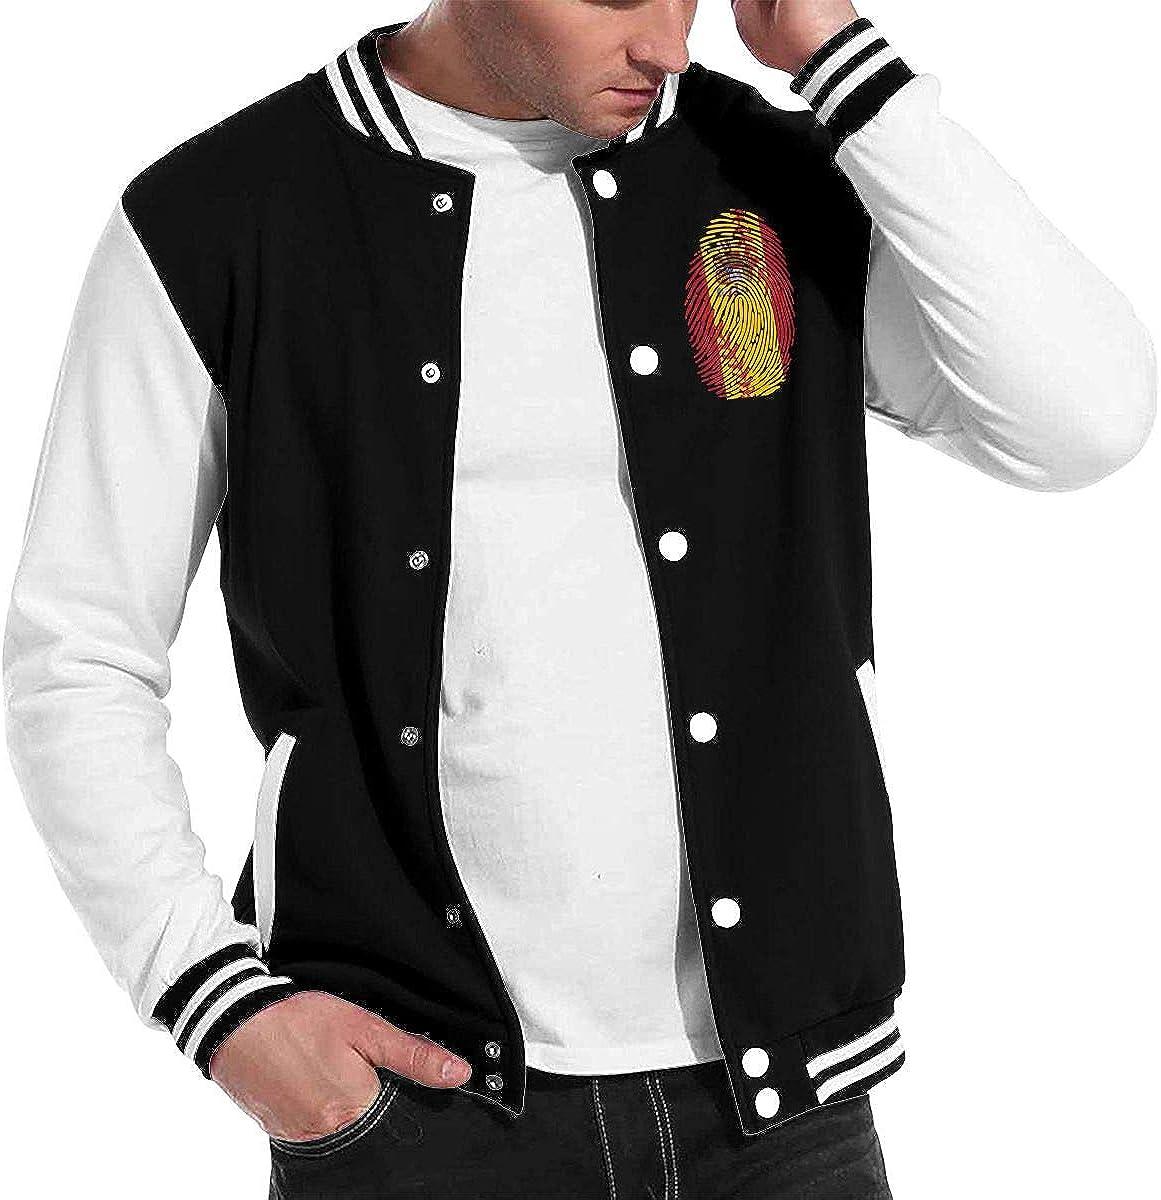 Spain Flag Baseball Its in My DNA Baseball Jacket Uniform Men Women Varsity Premium Jacket Sweater Coat